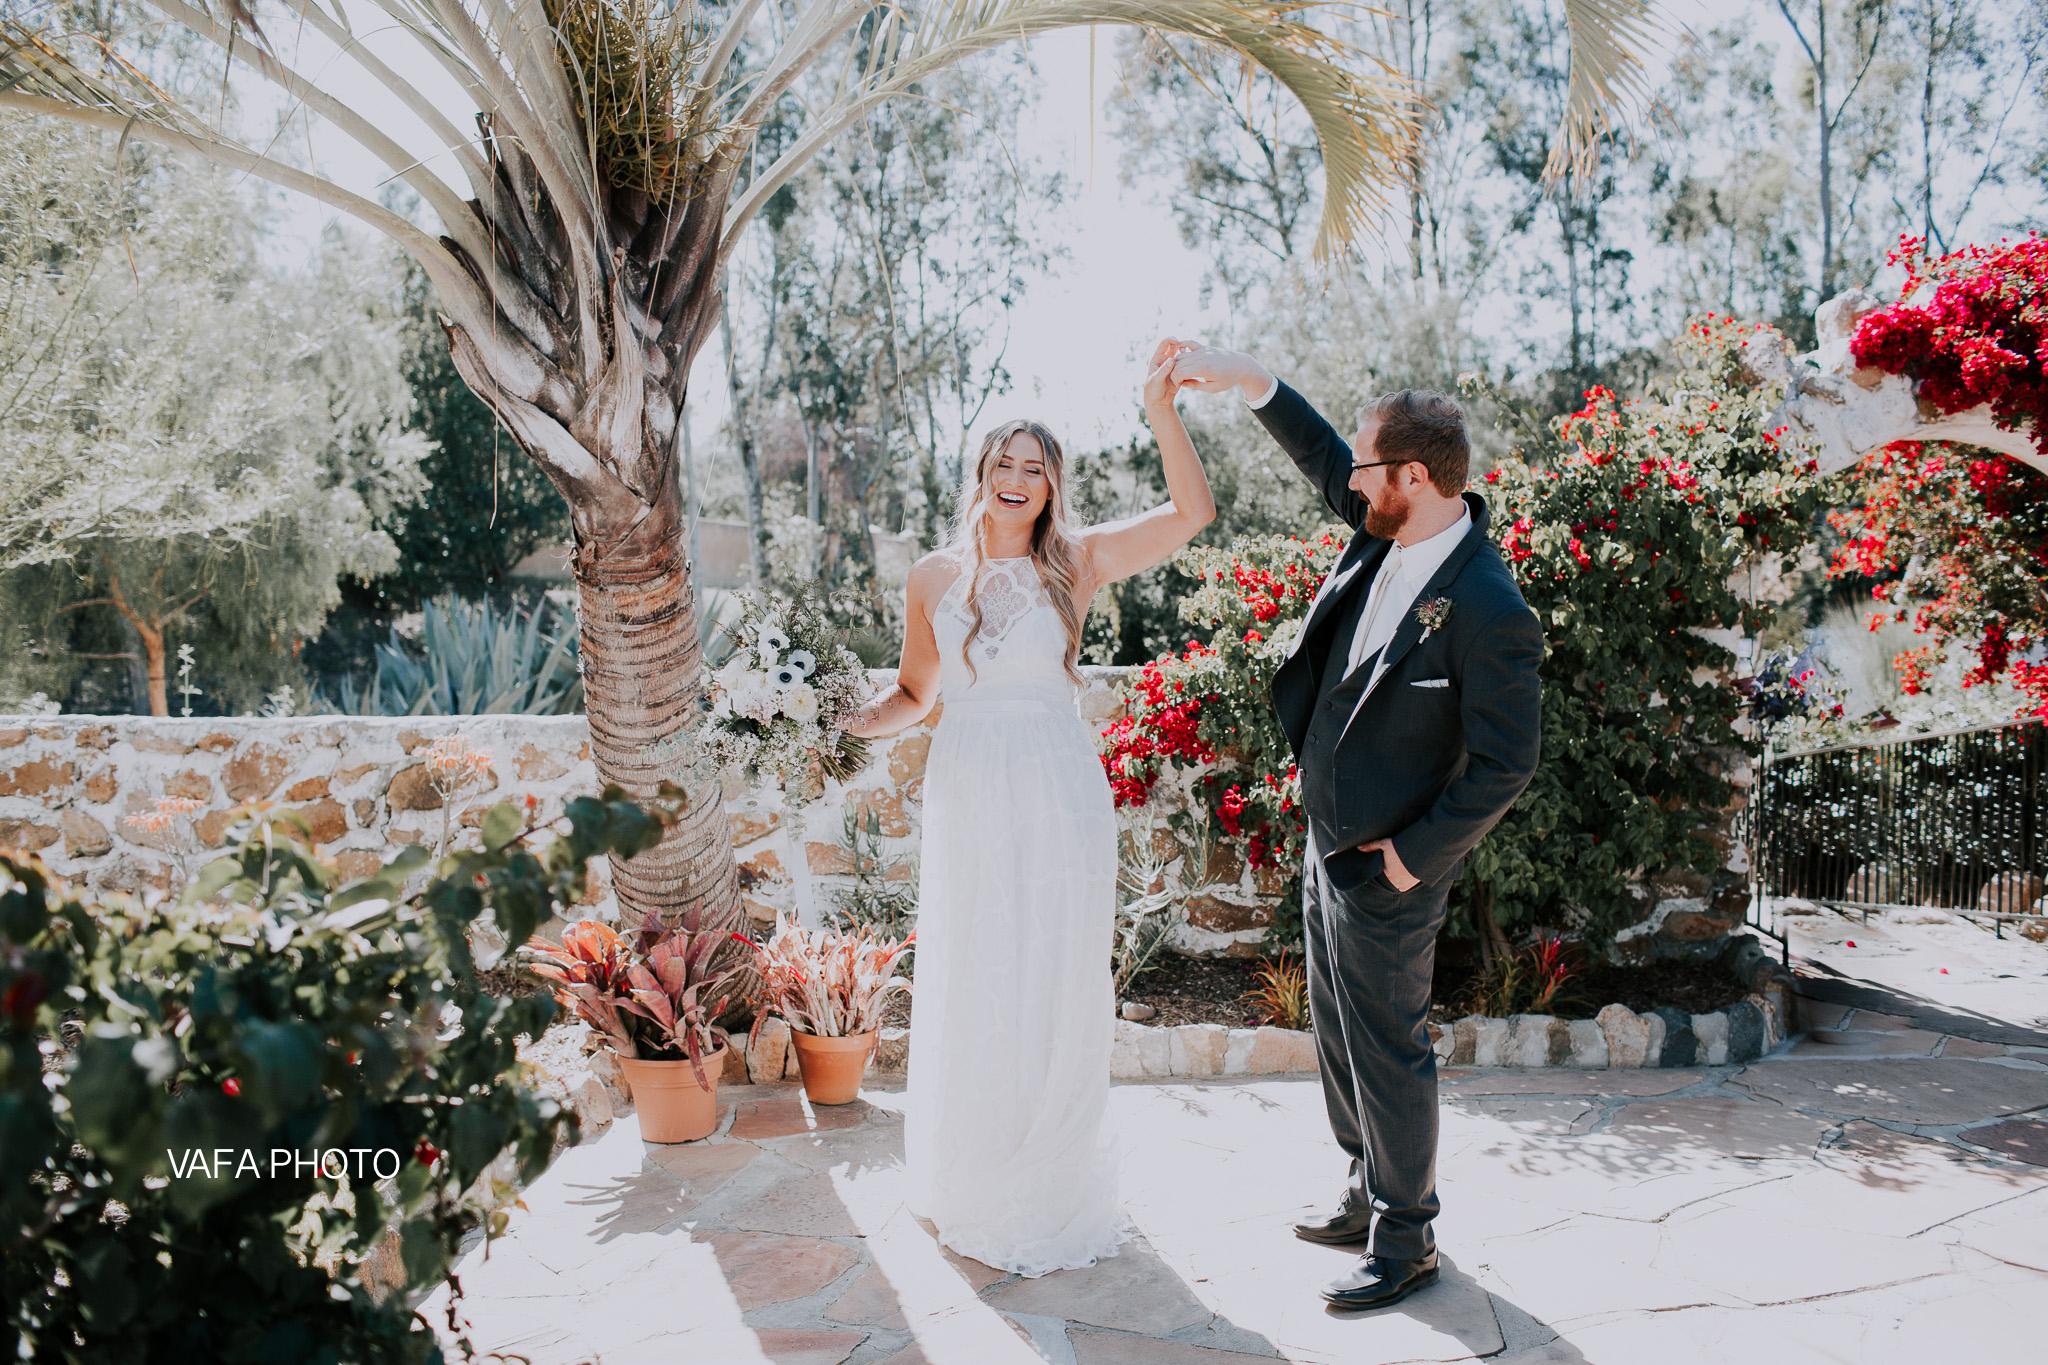 Leo-Carrillo-Ranch-Wedding-Lauren-Mike-Vafa-Photo-307.jpg